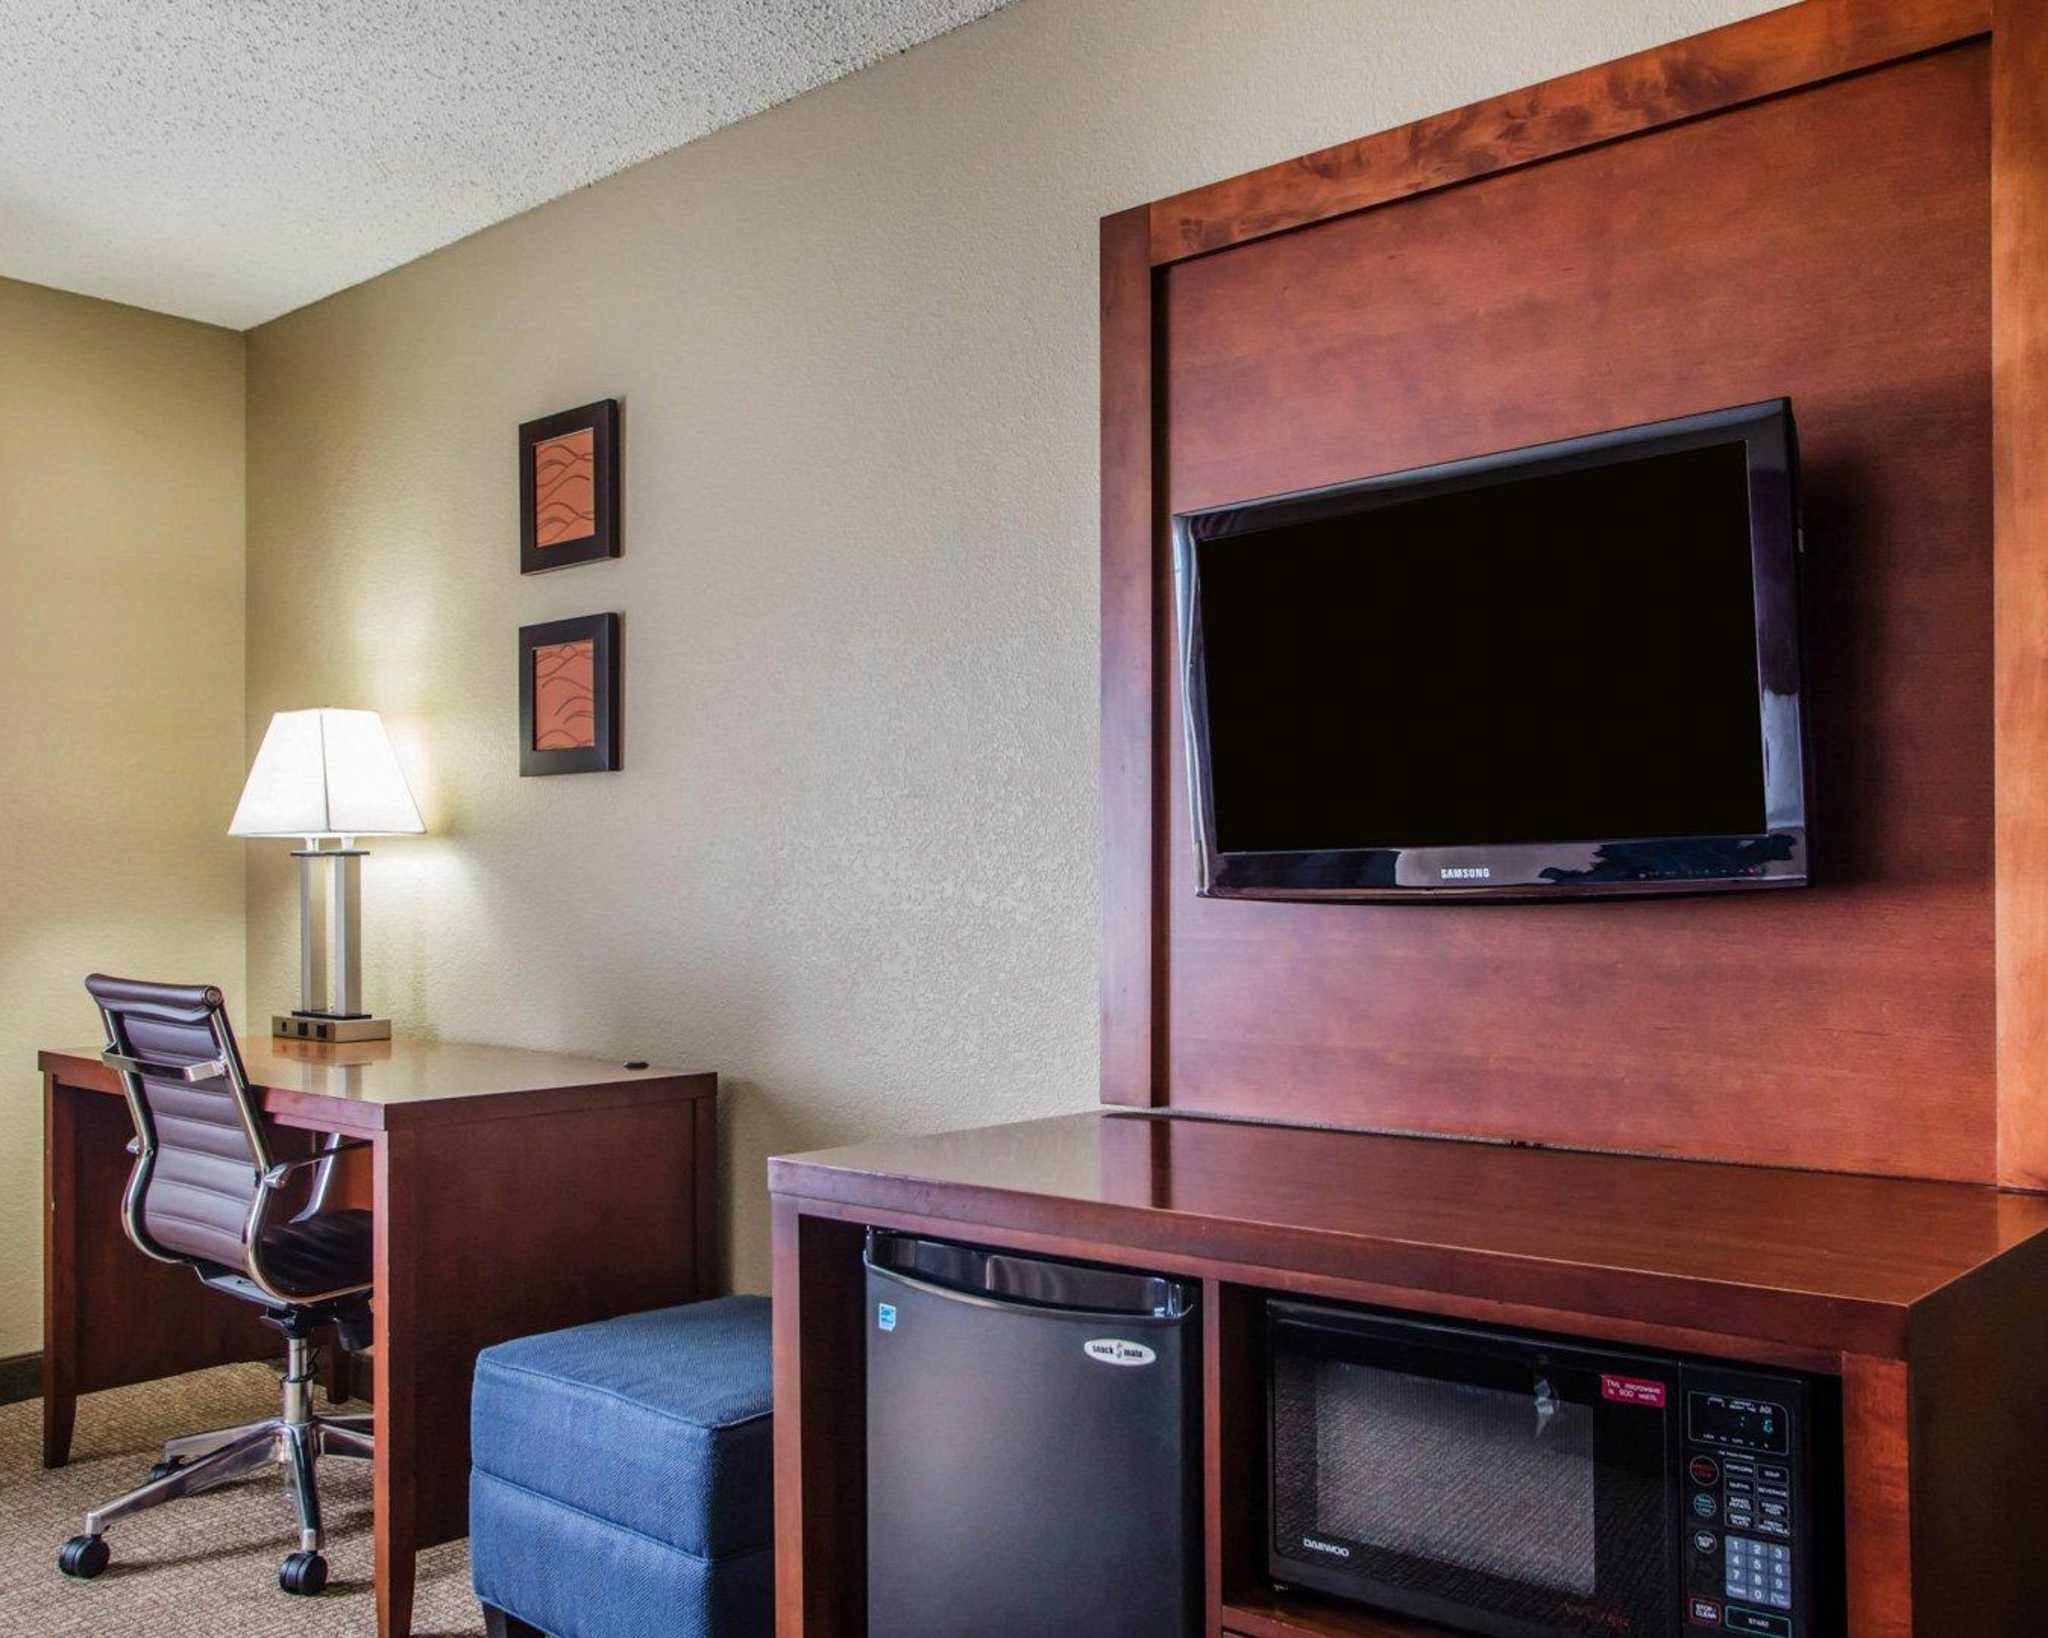 Comfort Inn & Suites Jackson - West Bend image 8